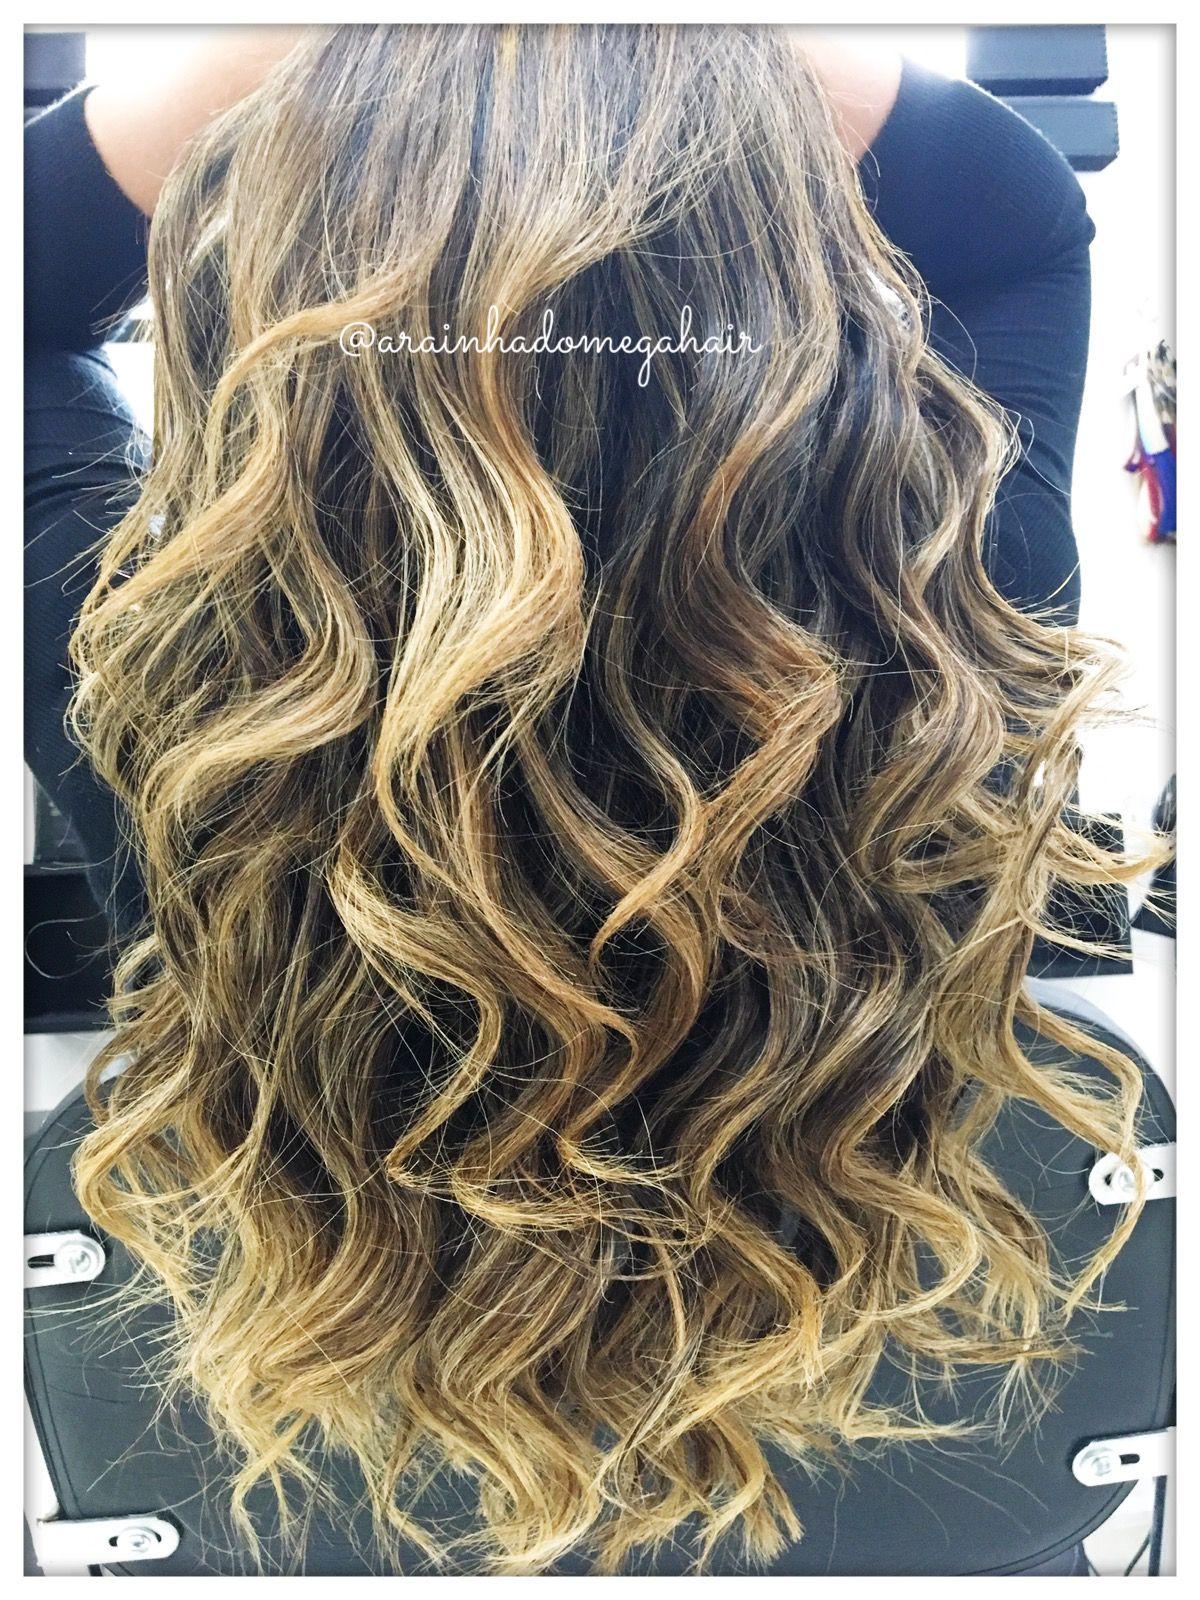 Mega hair no método ponto americano WhatsApp 11981176289